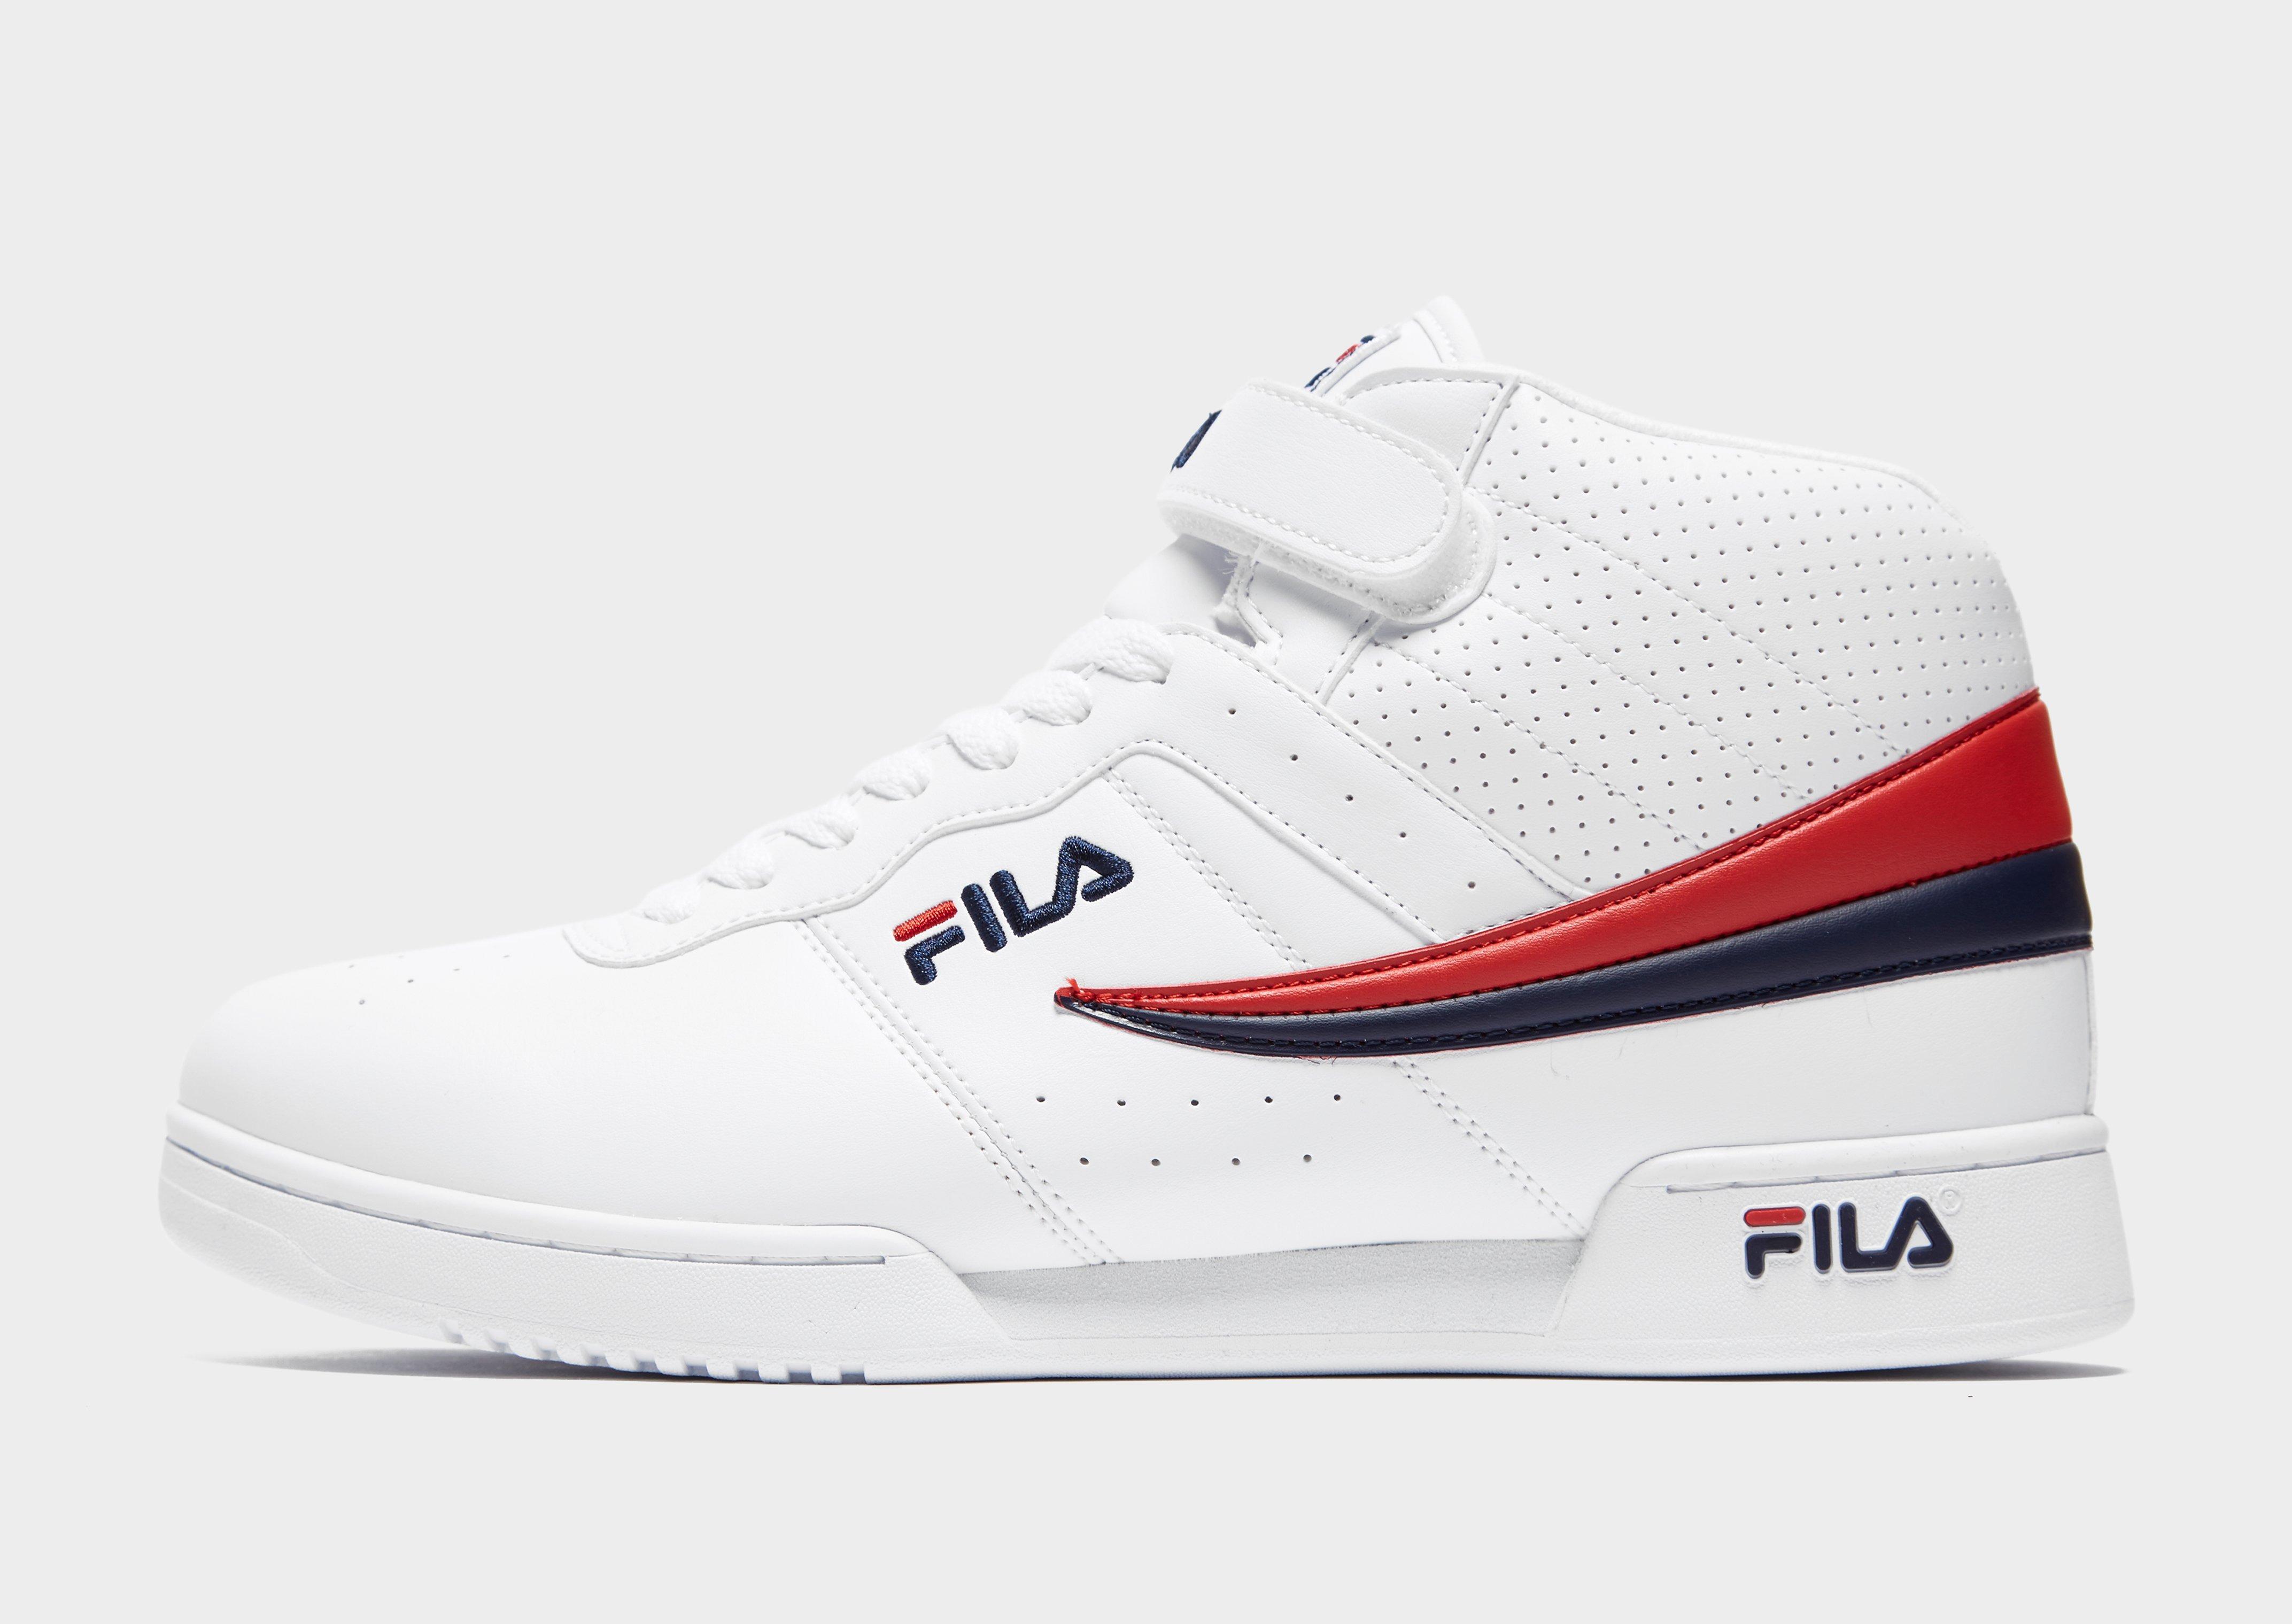 FilaF-13-M - F-13 - Homme Homme, Blanc (